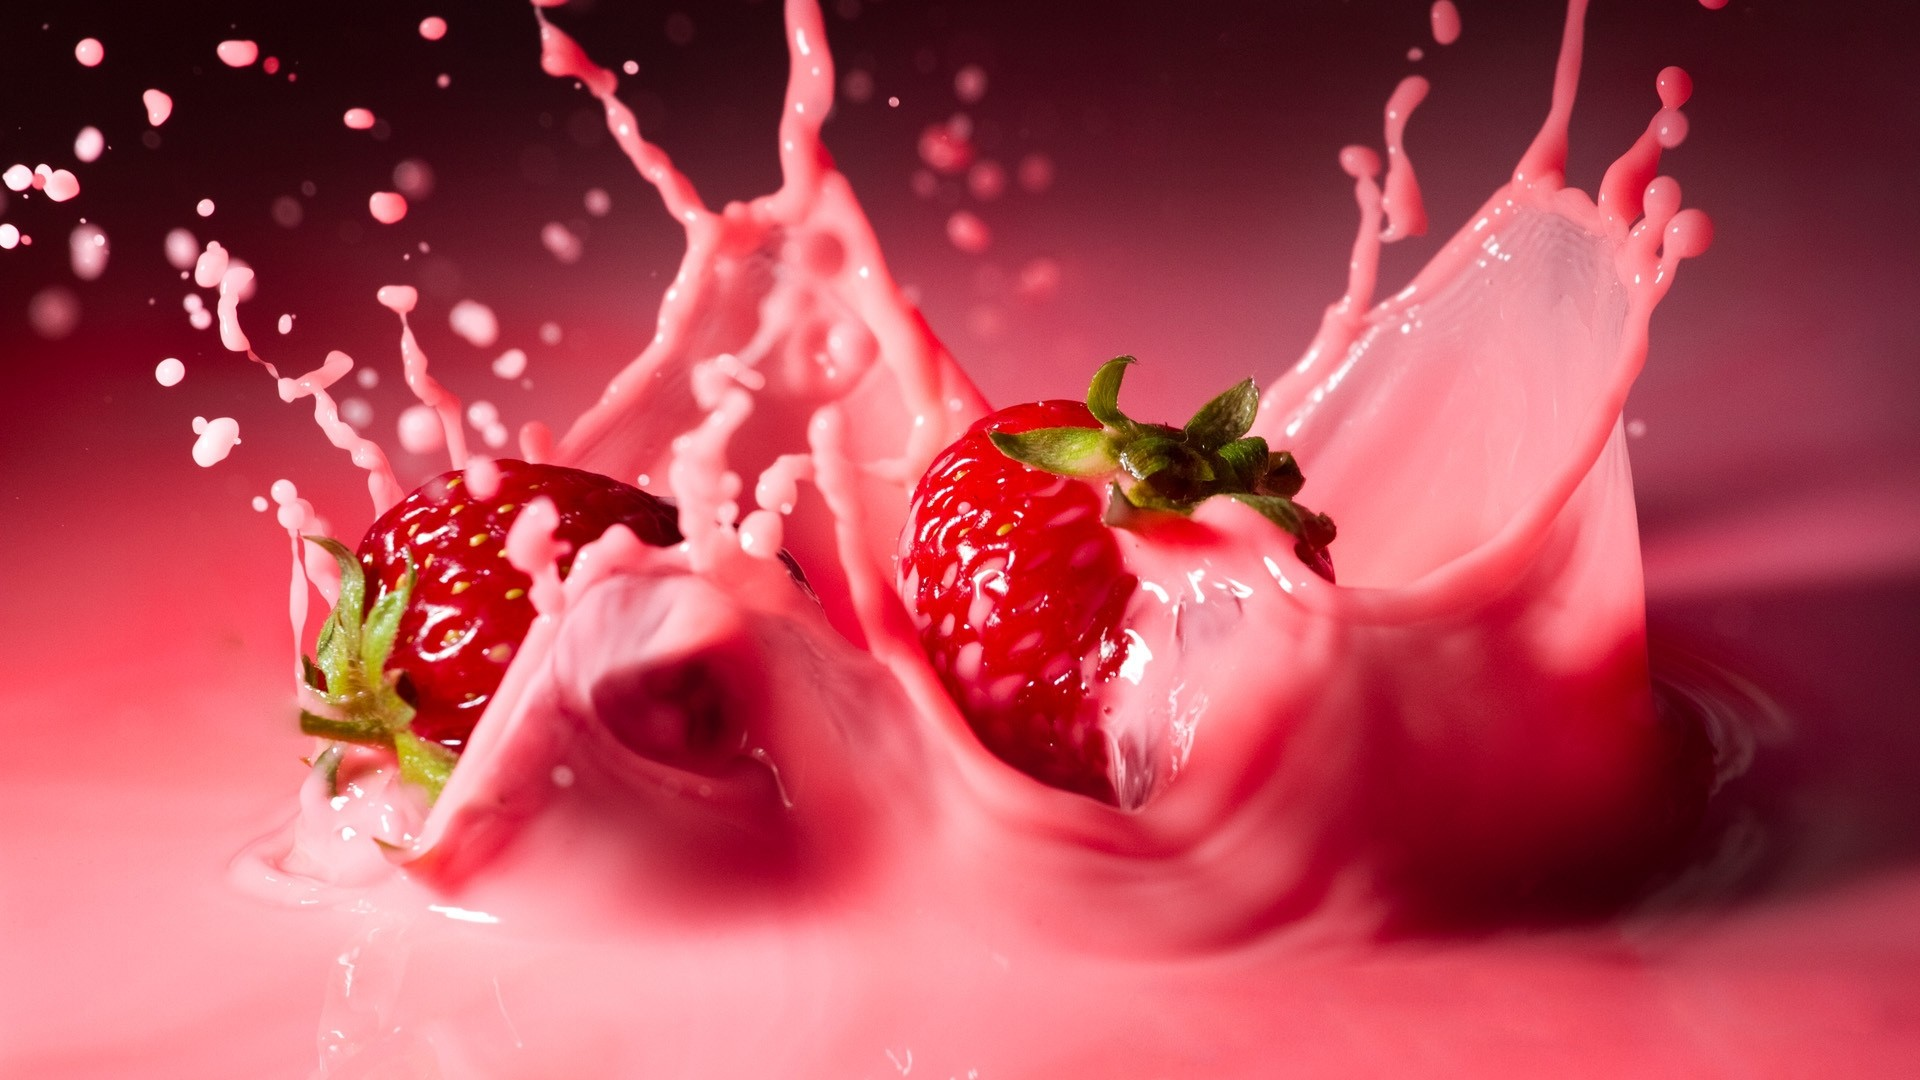 Strawberry Wallpaper Picture hd